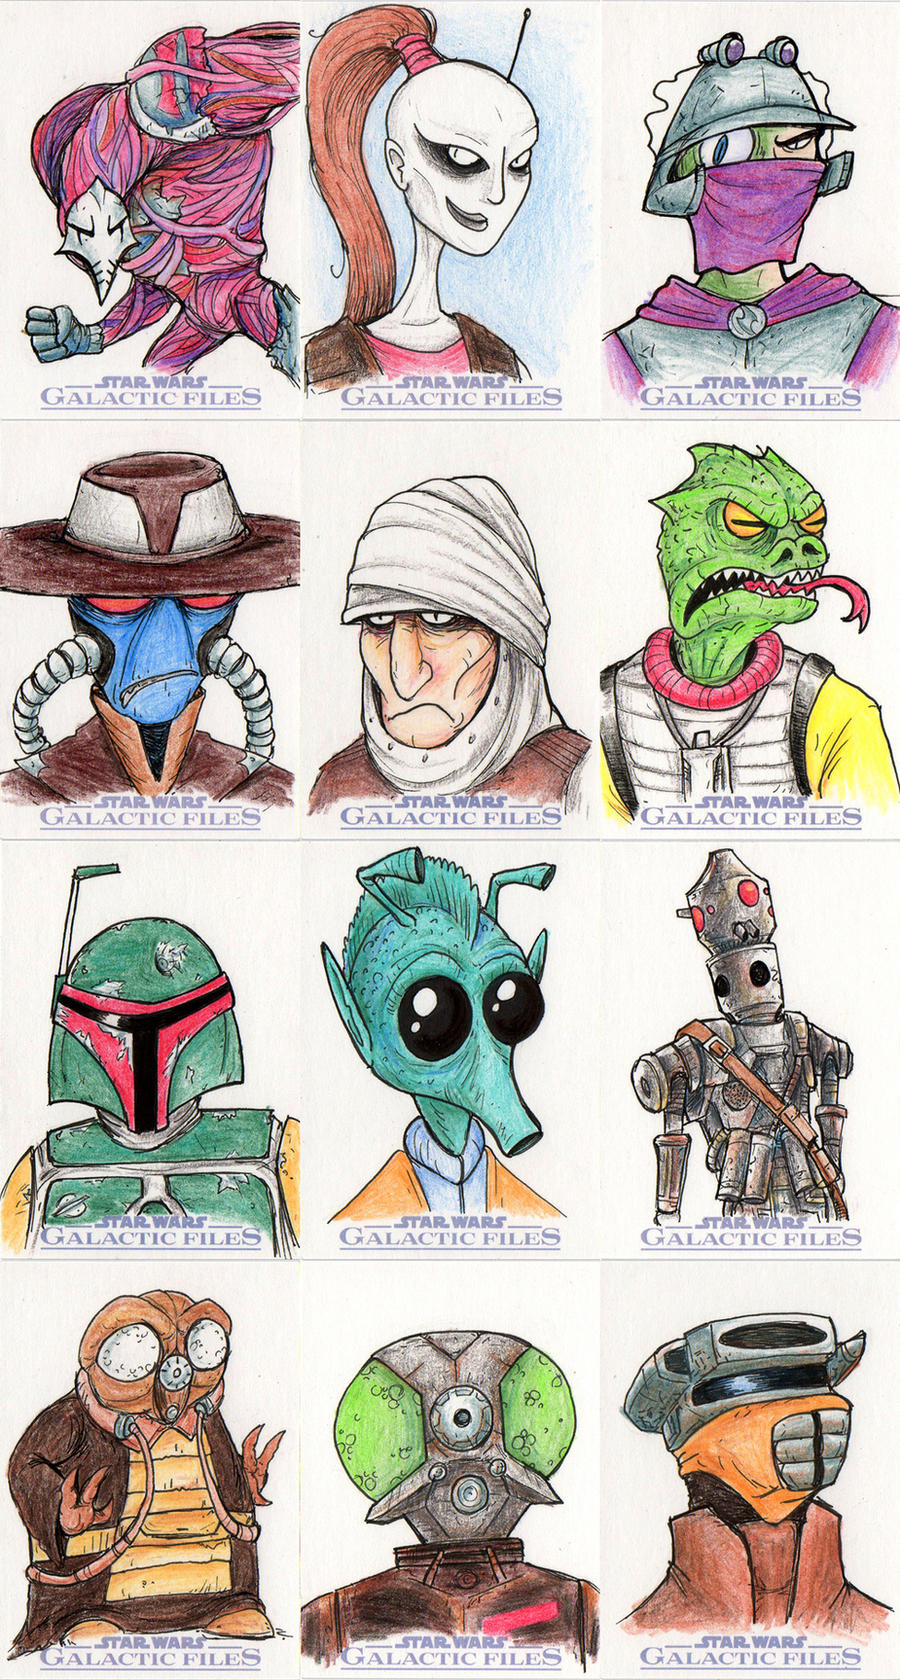 Star Wars Galactic Files 01 By Monster Man 08 On Deviantart